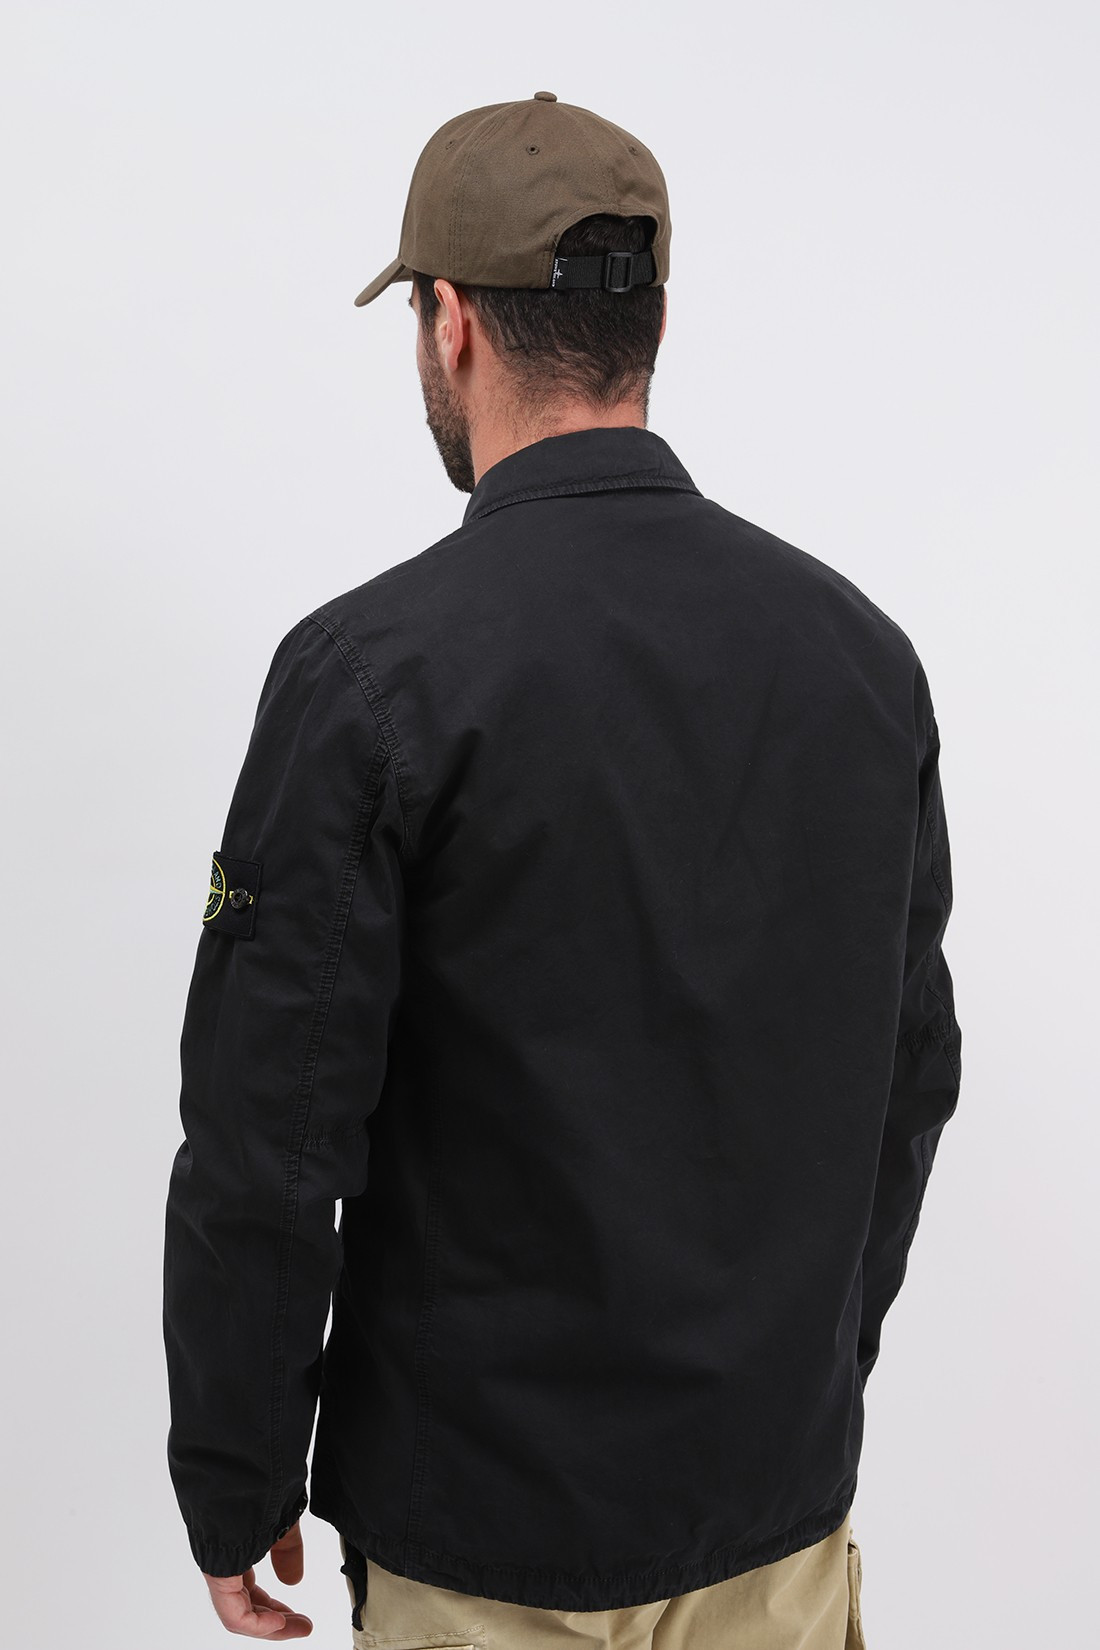 STONE ISLAND / 113wn overshirt v0129 Nero